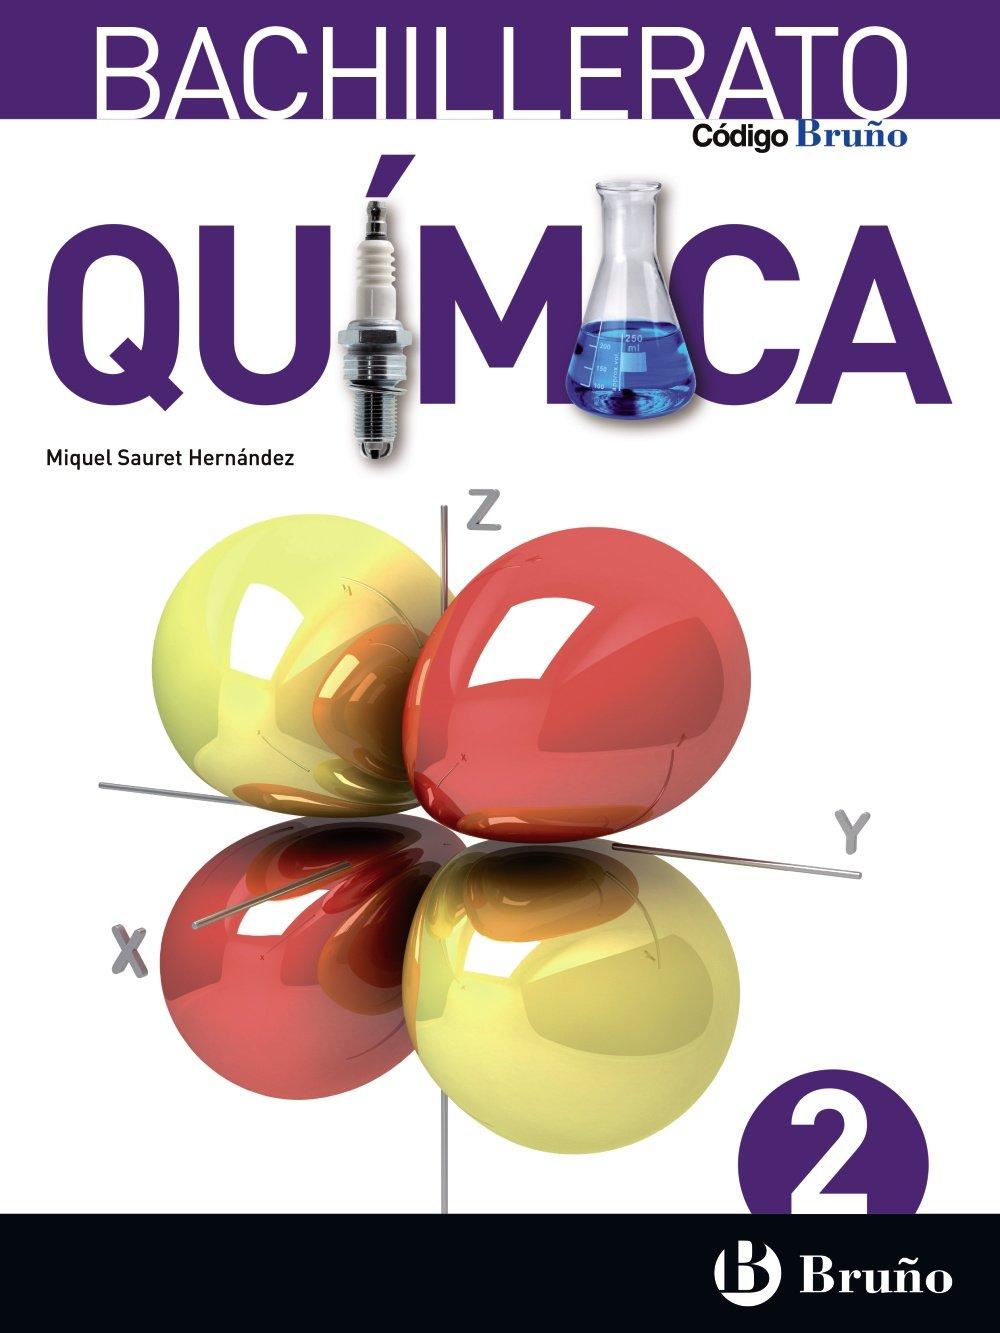 Química 2 Bachillerato Bruño Soluciones 2020 / 2021